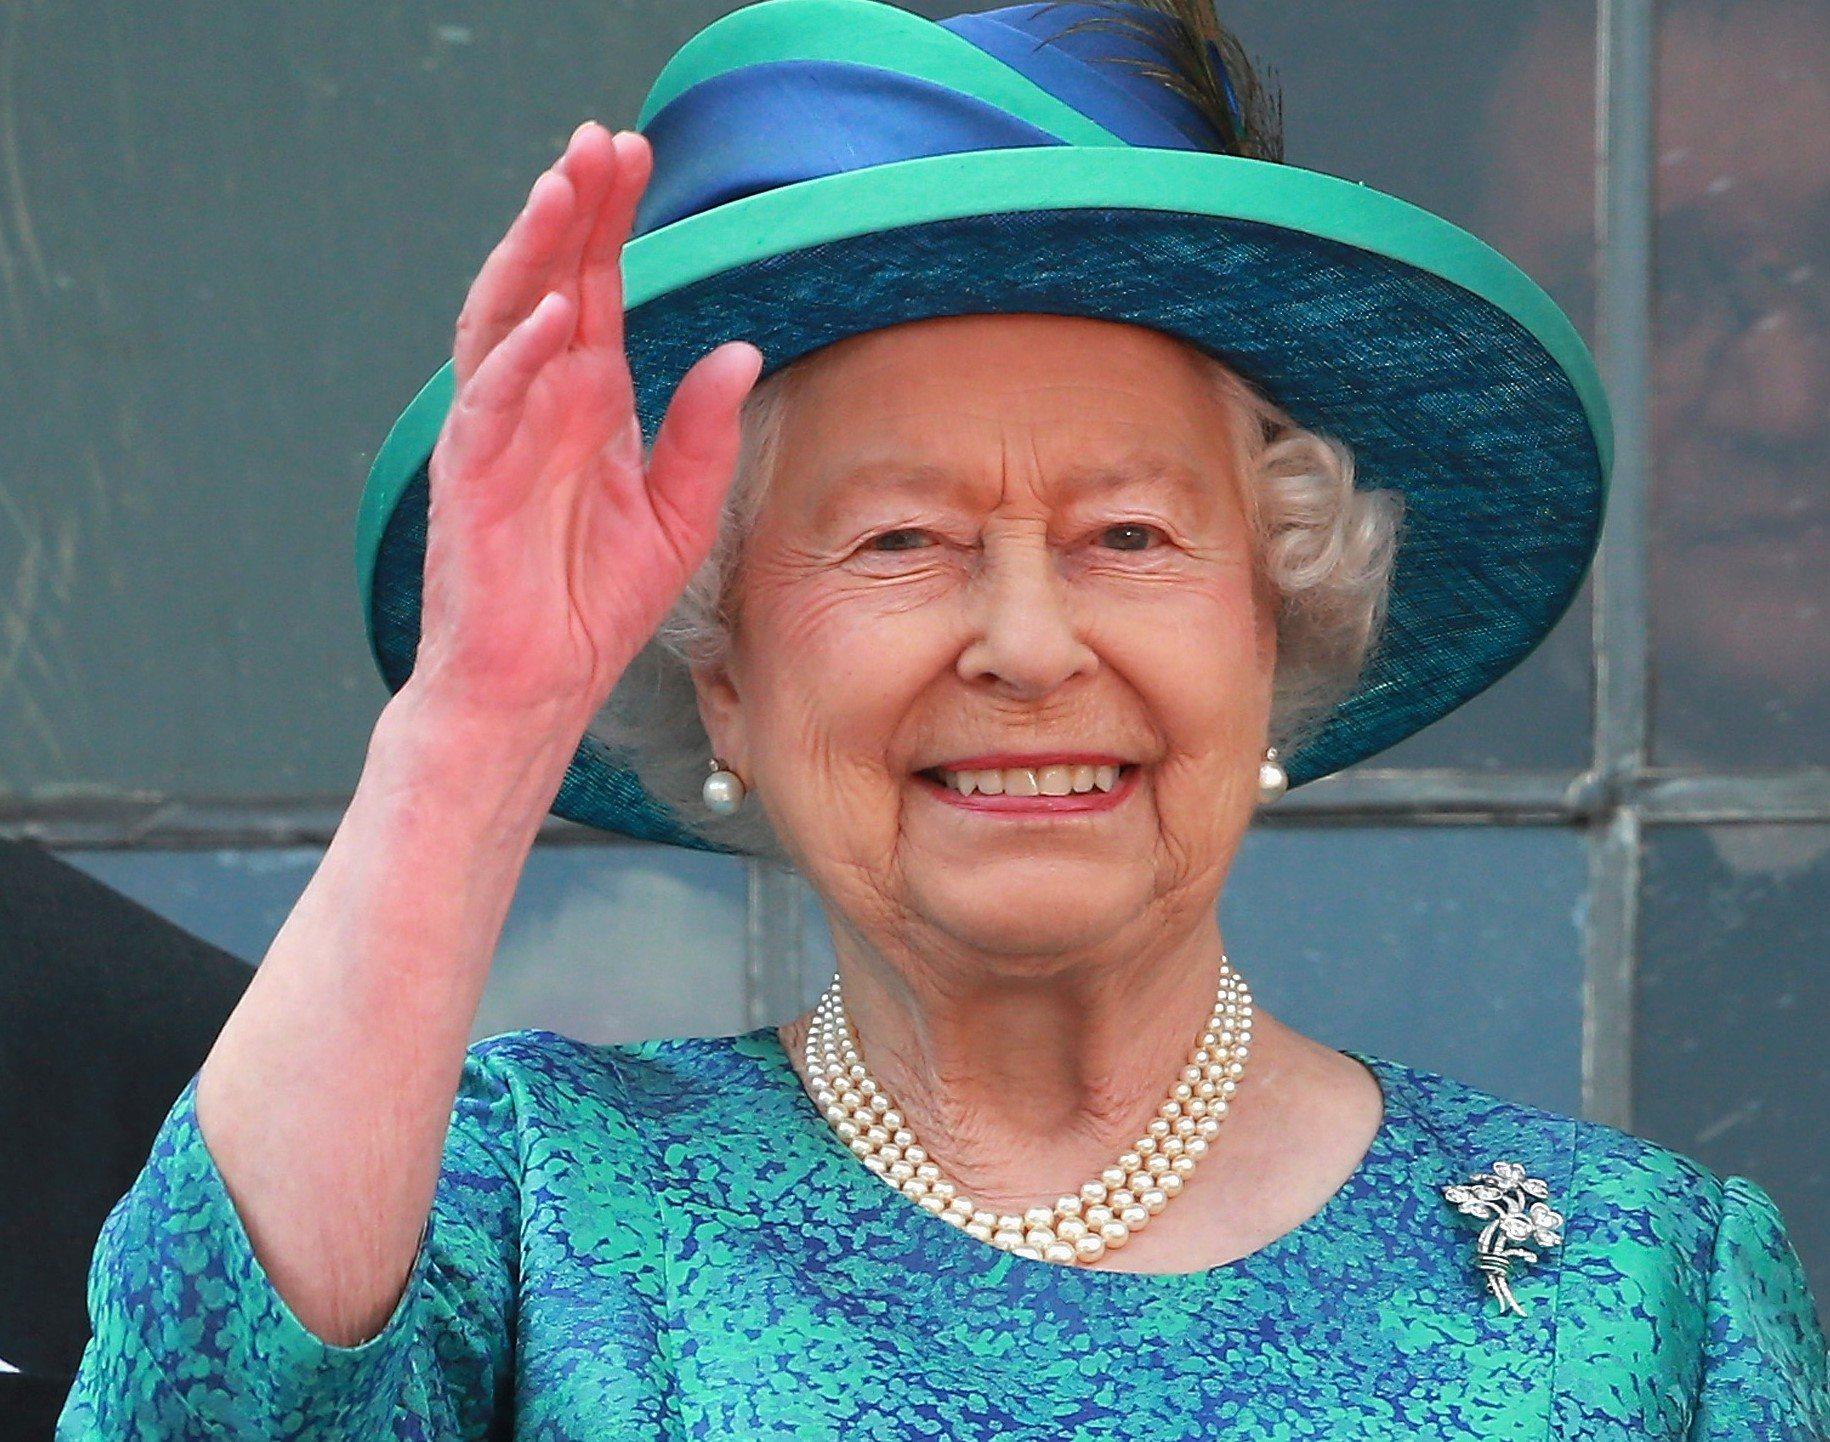 Queen Elizabeth II Visits Frankfurt am Main